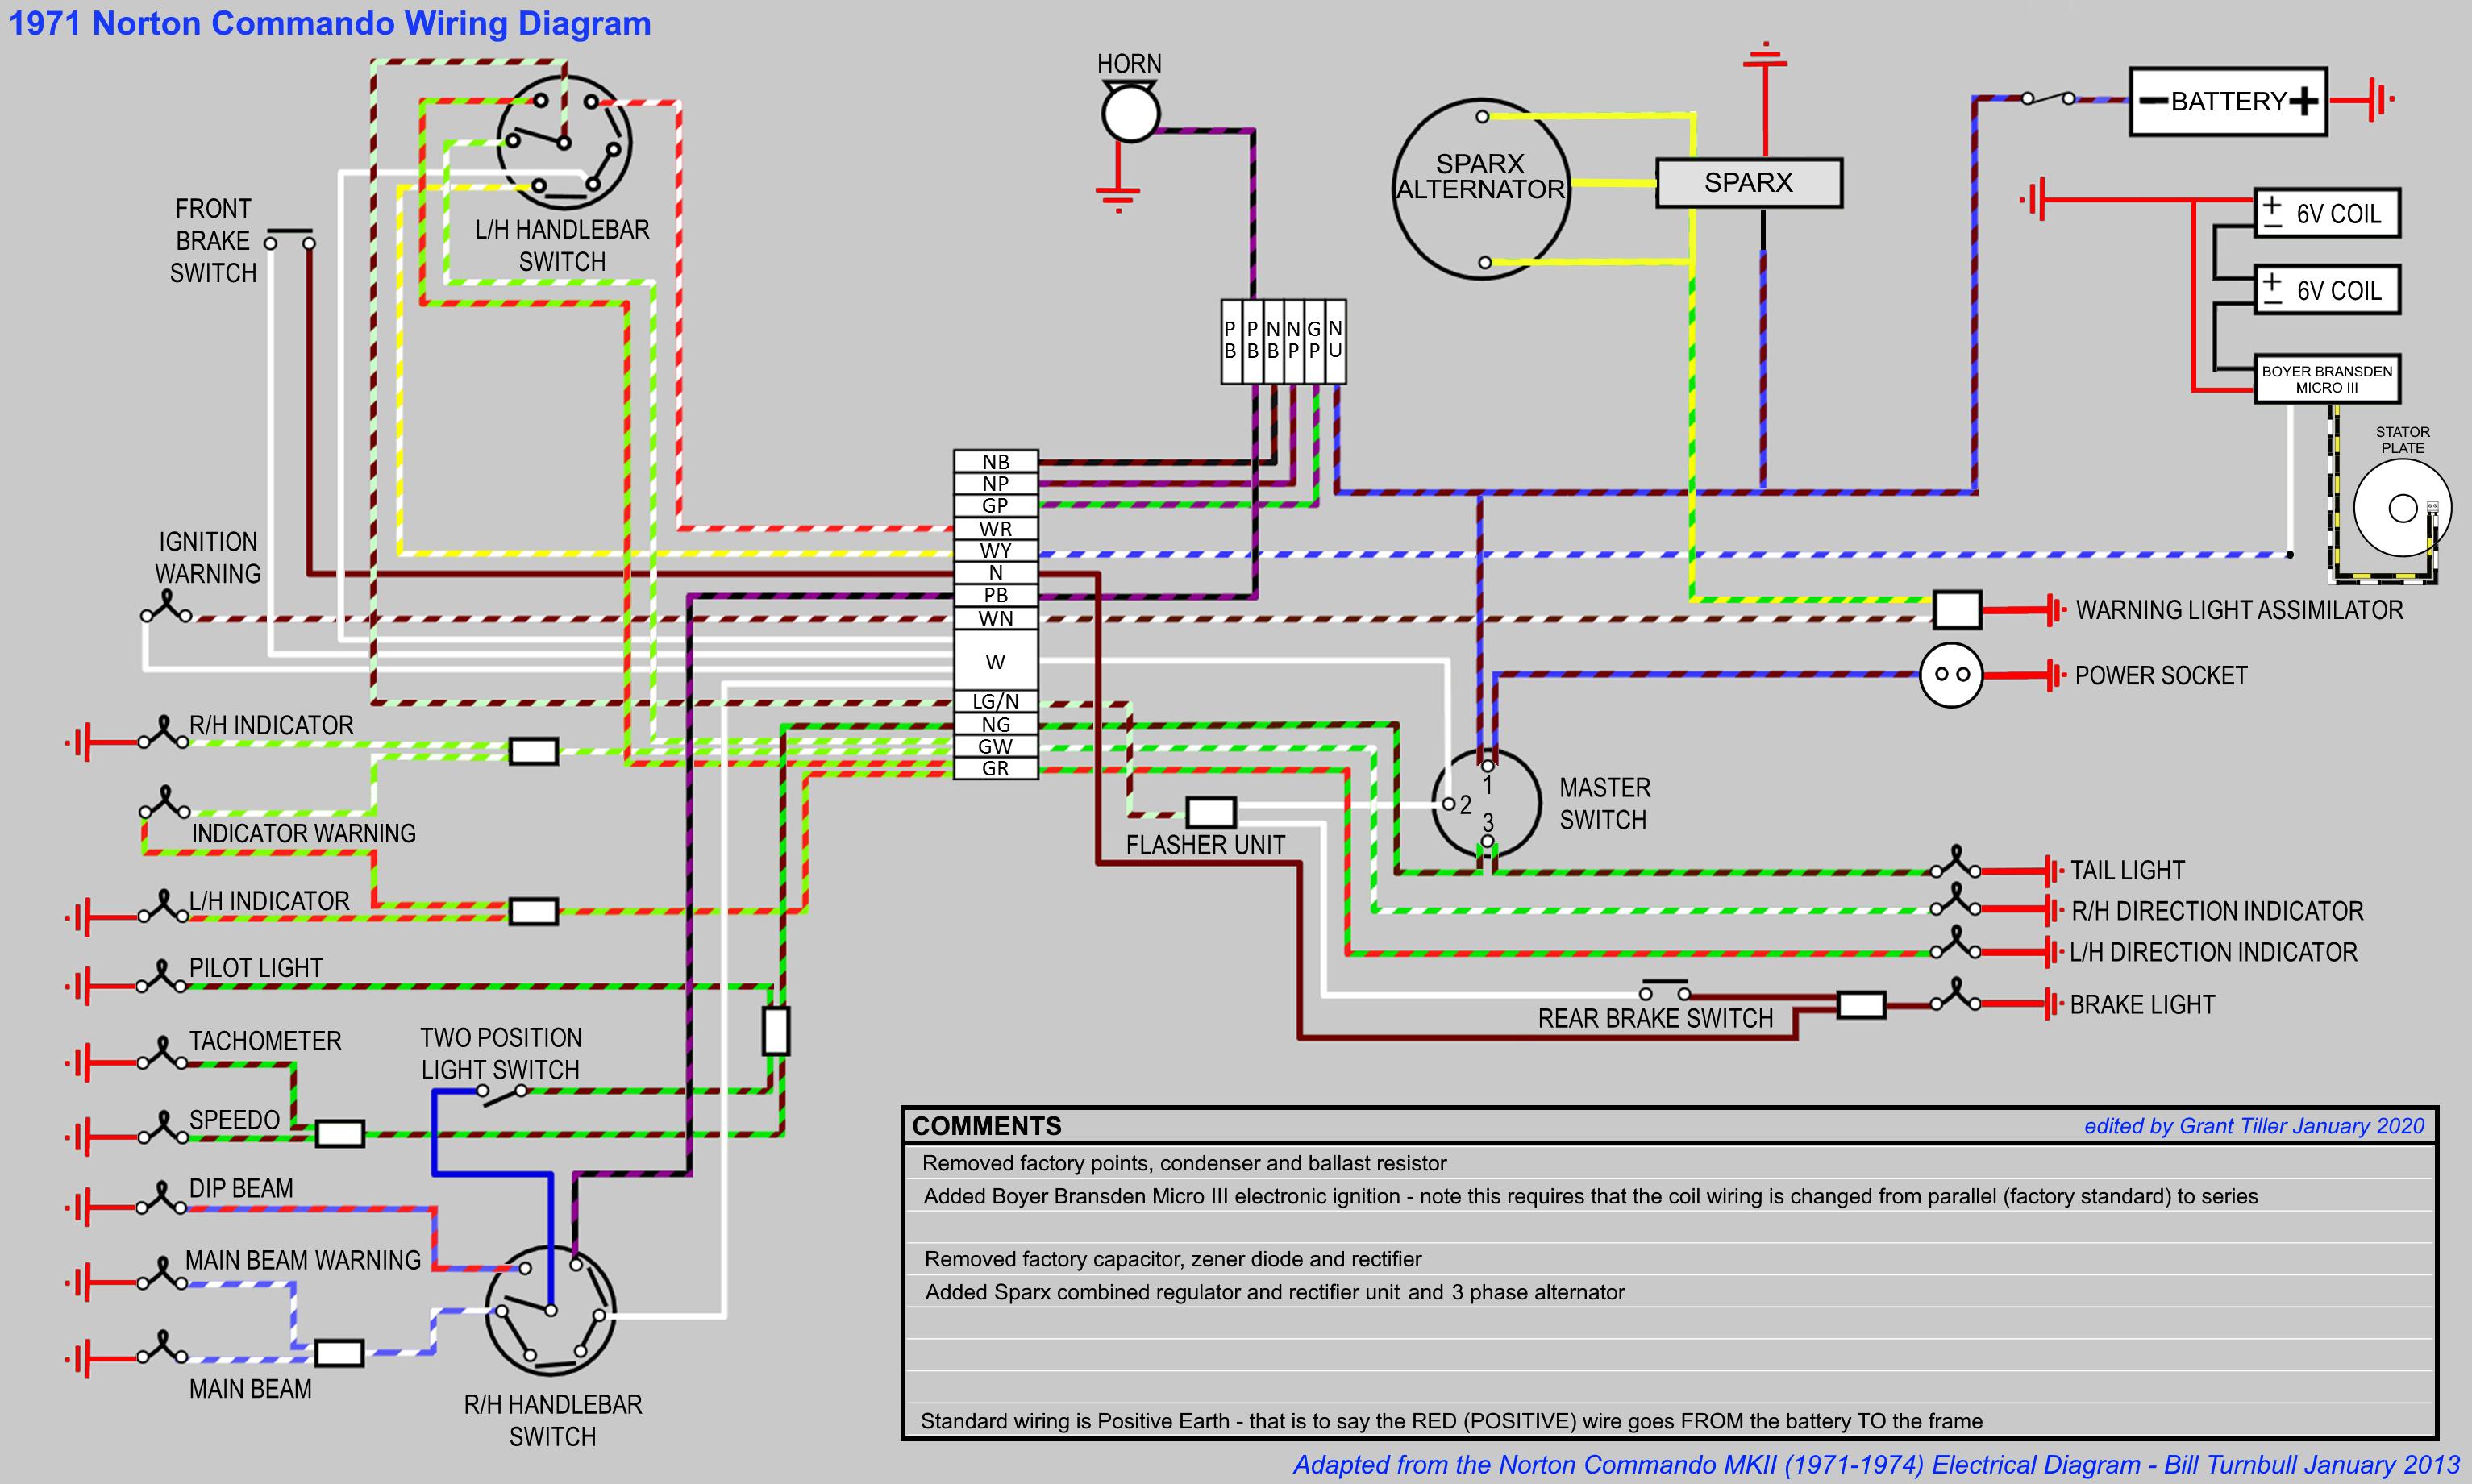 Commando Wiring Diagram Boyer Sparx 3 Phase